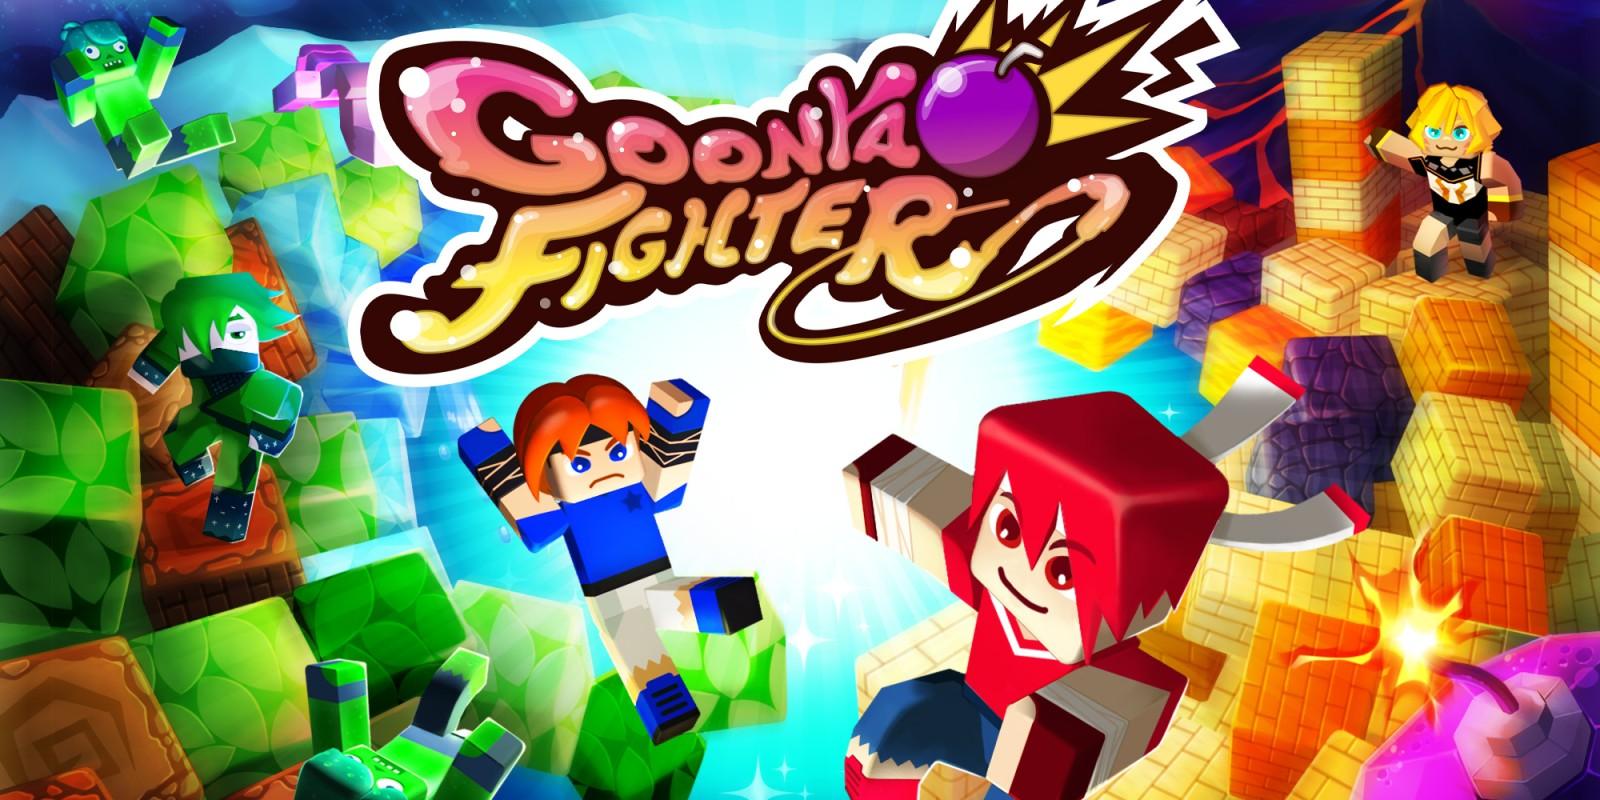 Goonya Fighter Nintendo Switch